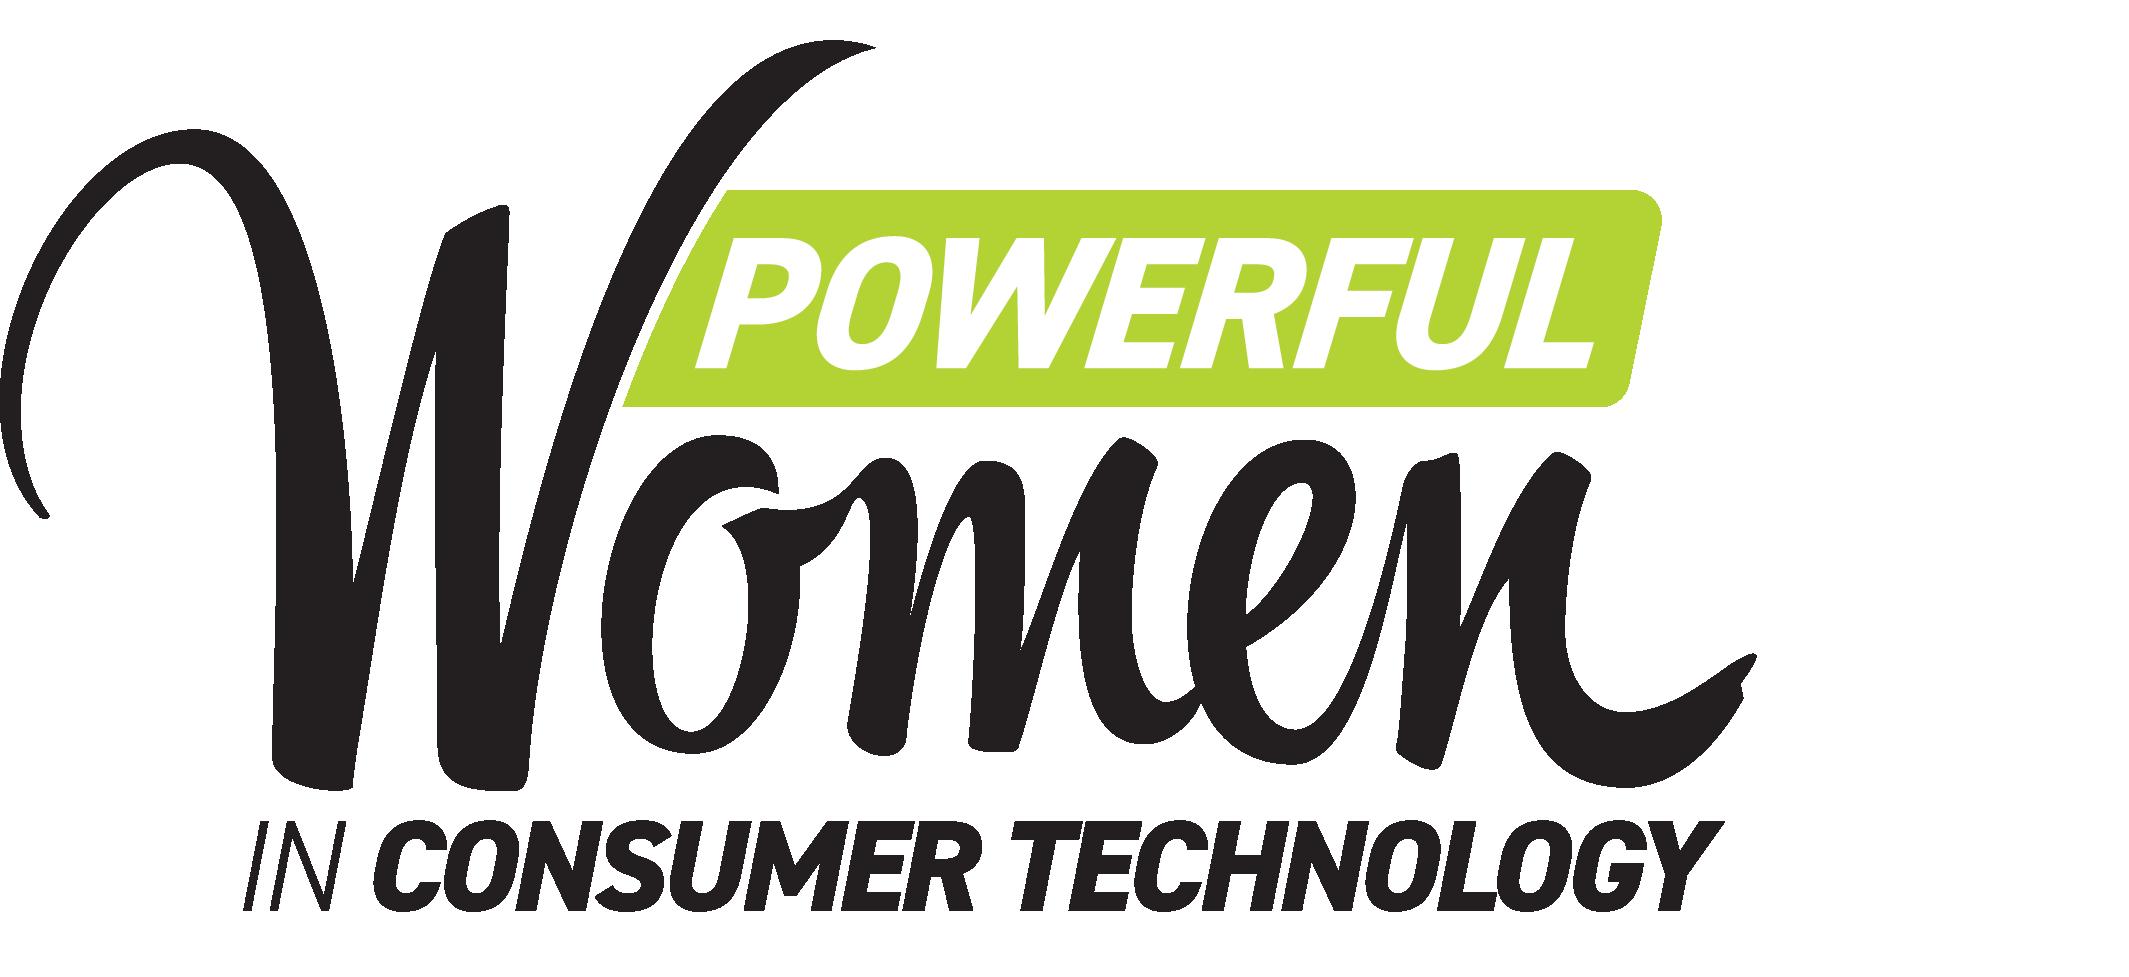 A1705003_Powerful_Women_CT